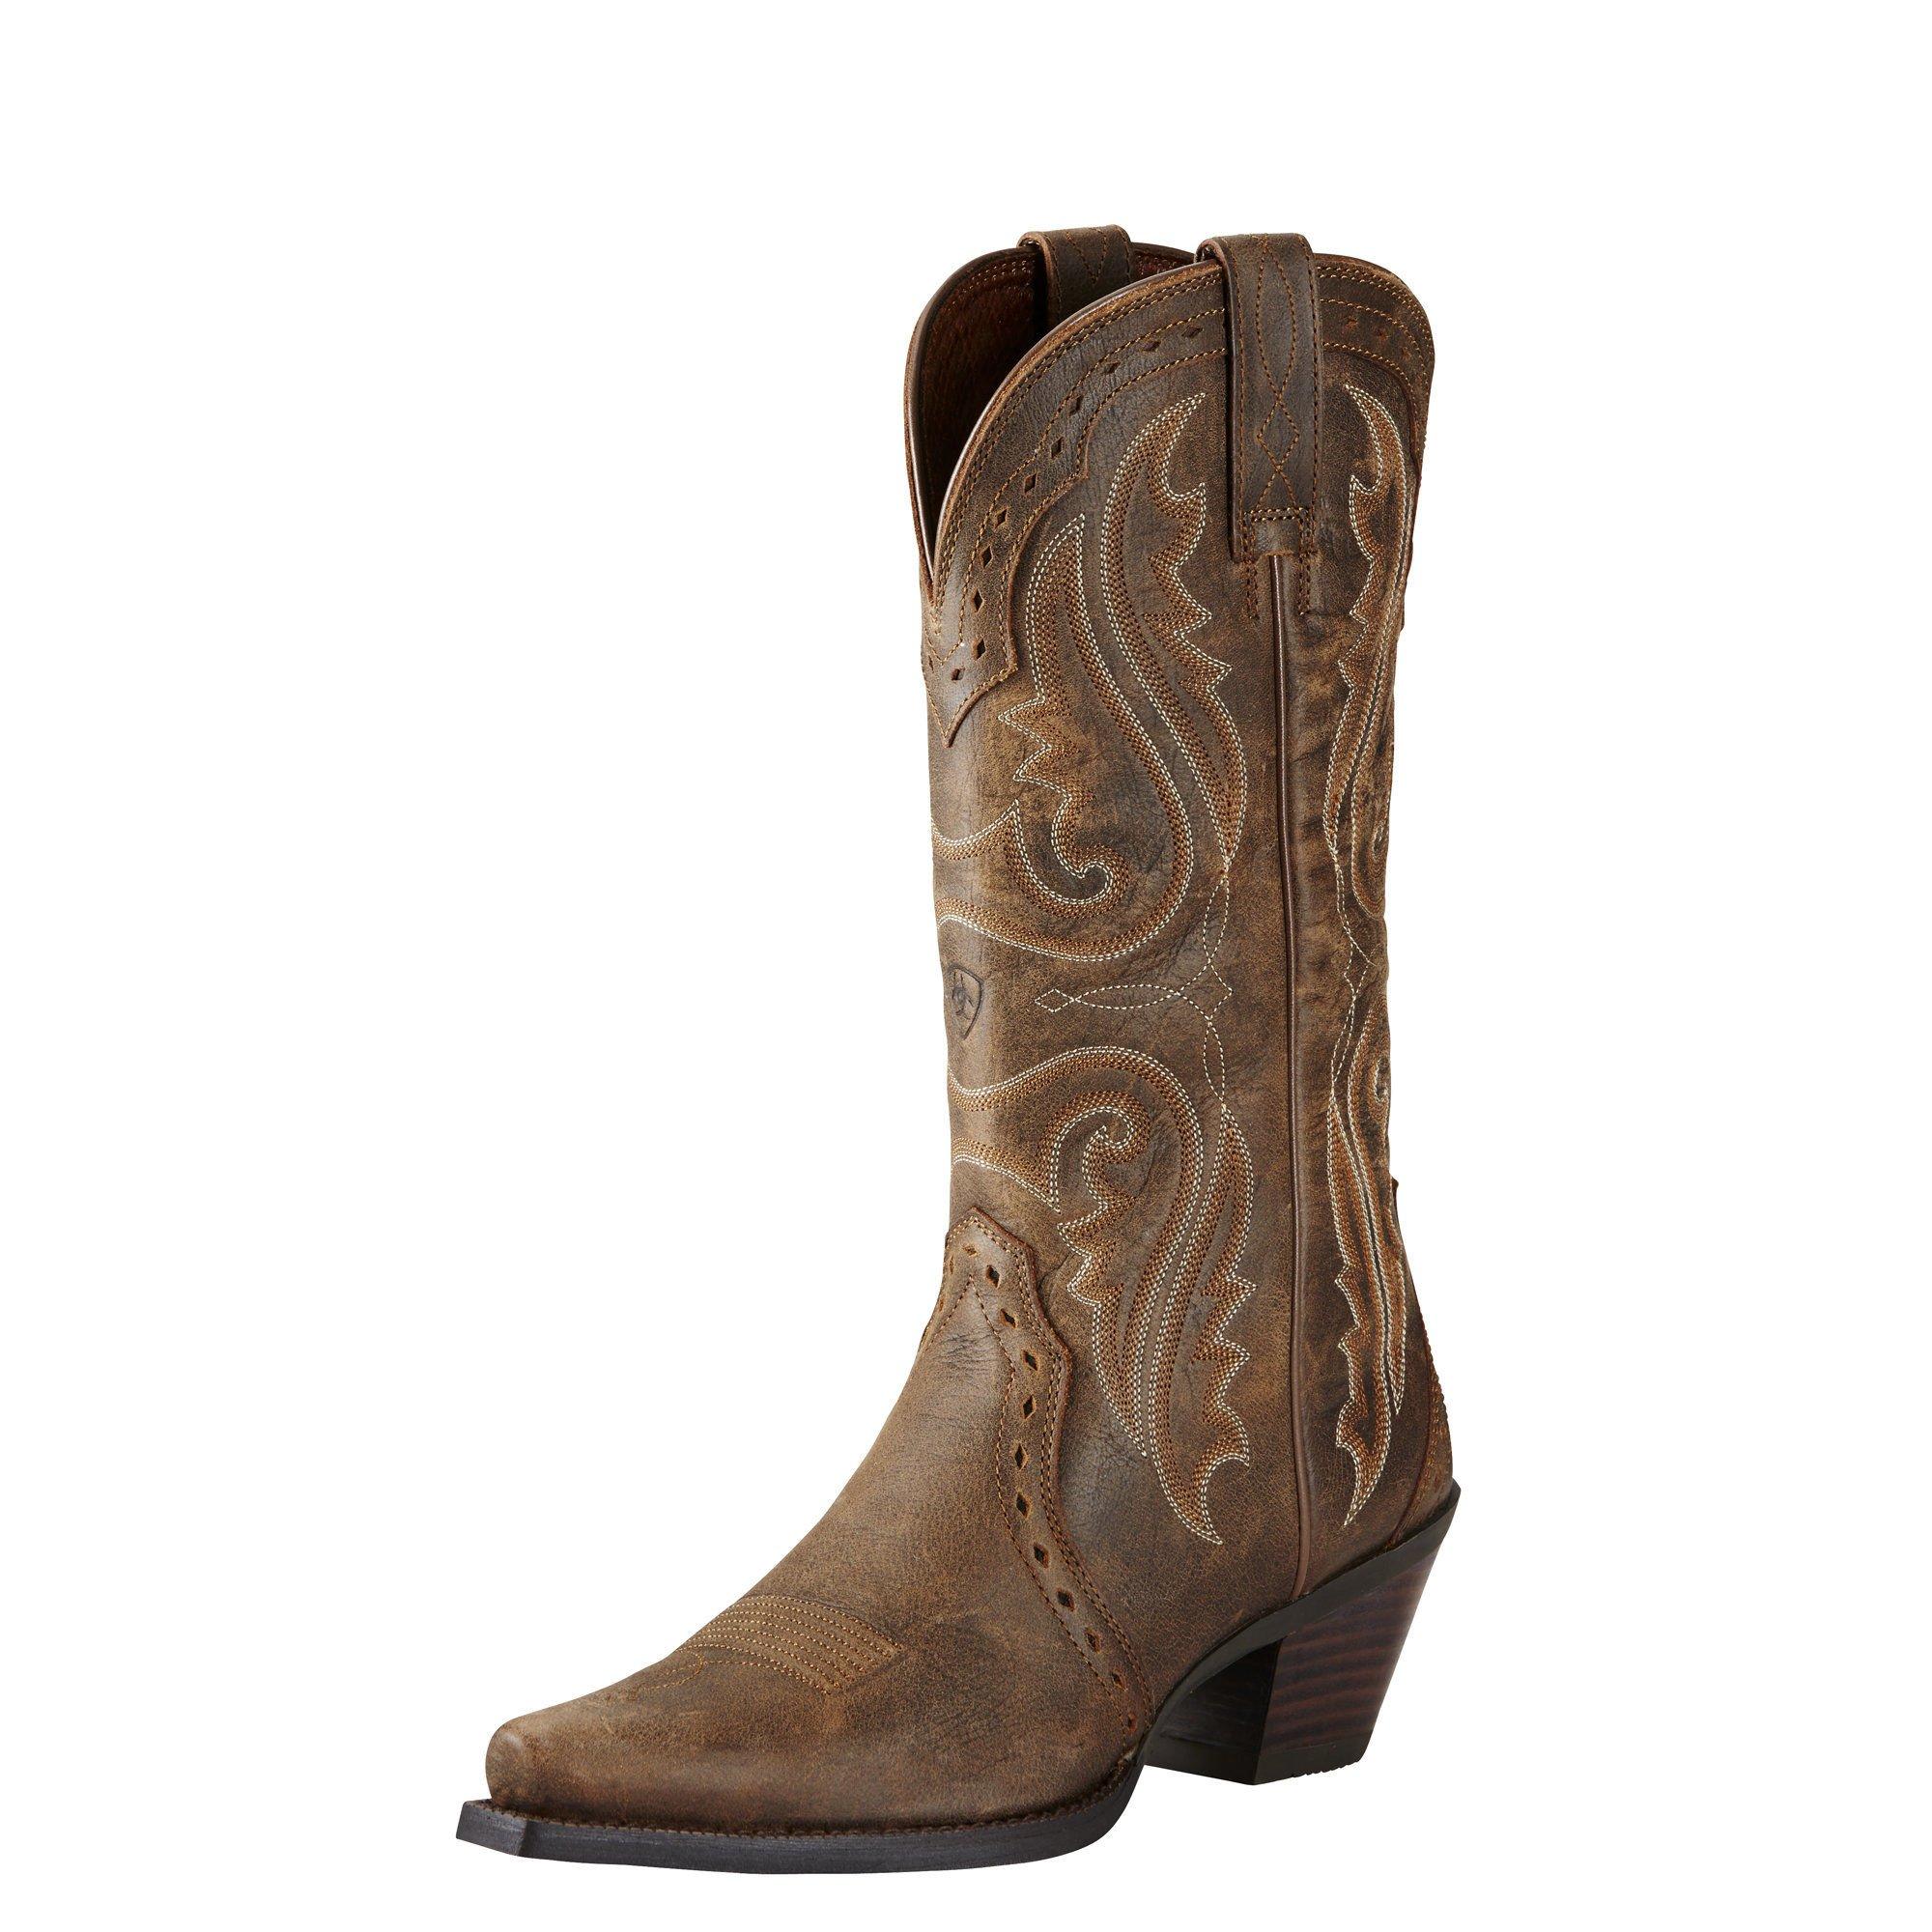 Ariat Women's Heritage X Toe Western Cowboy Boot, Vintage Bomber, 7 B US